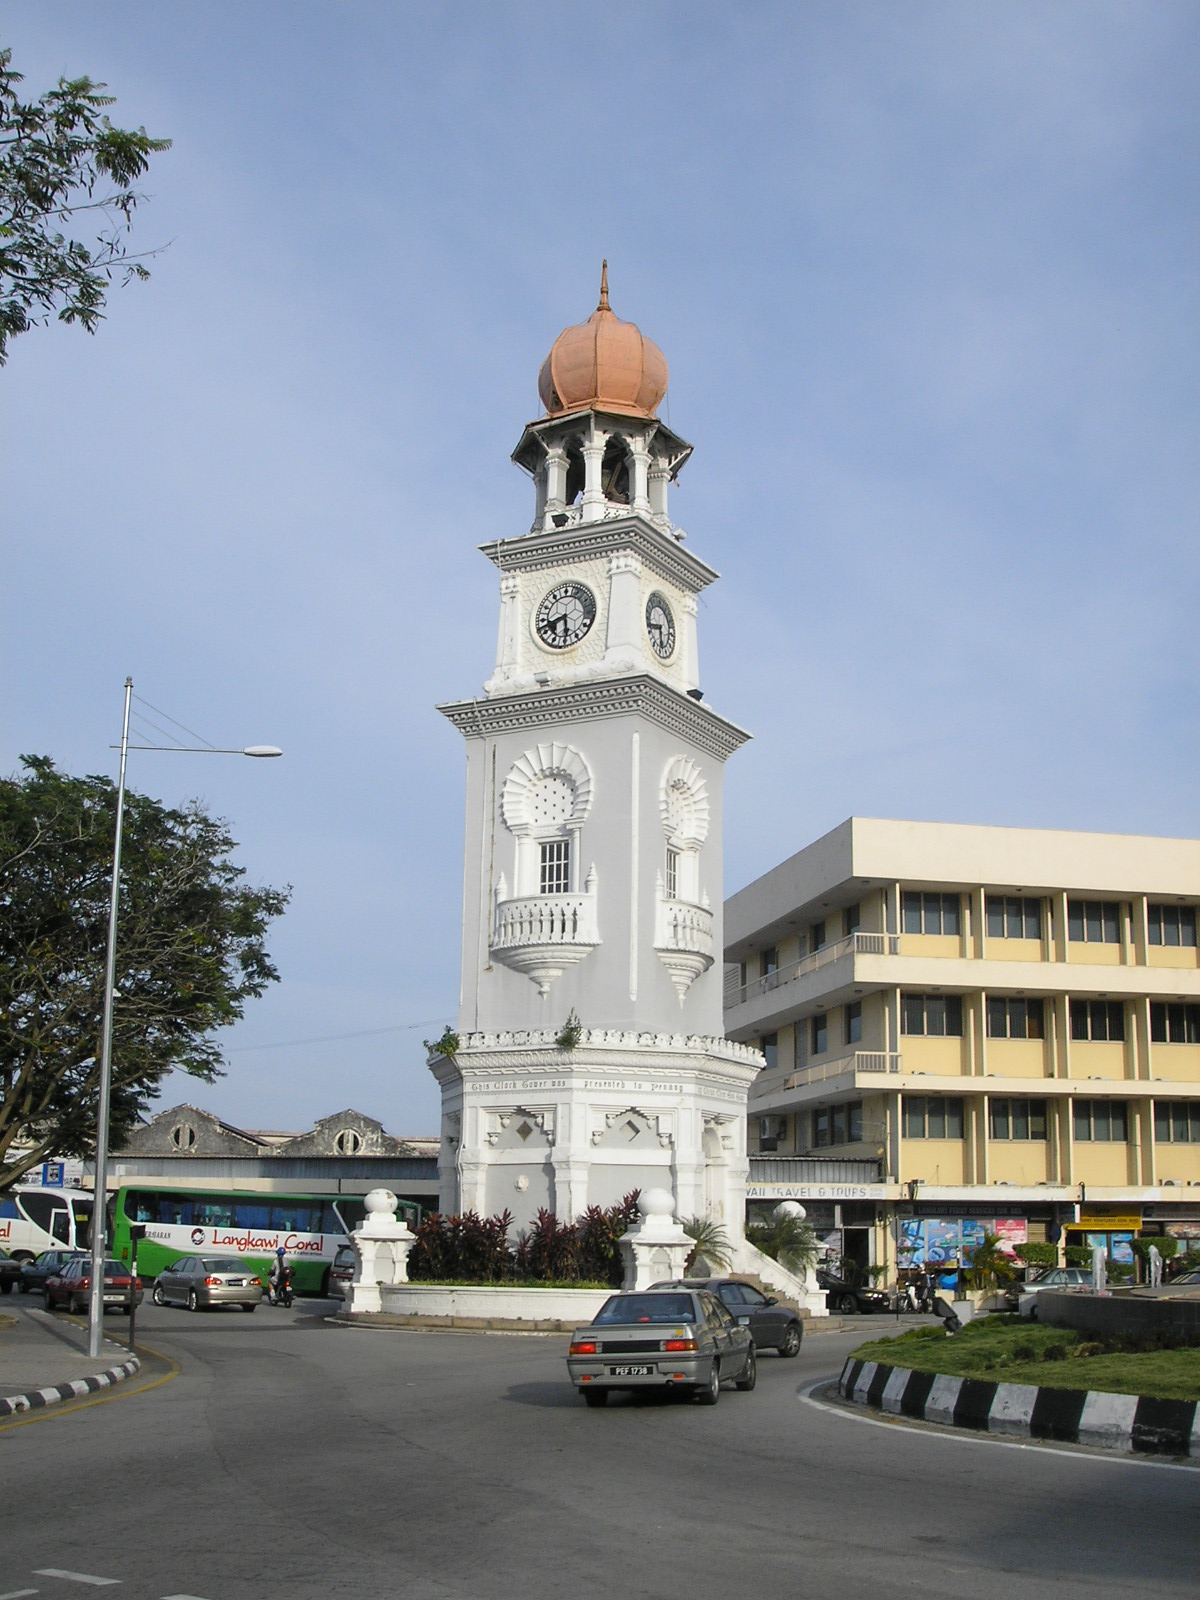 Jubilee Clock Tower Wikipedia